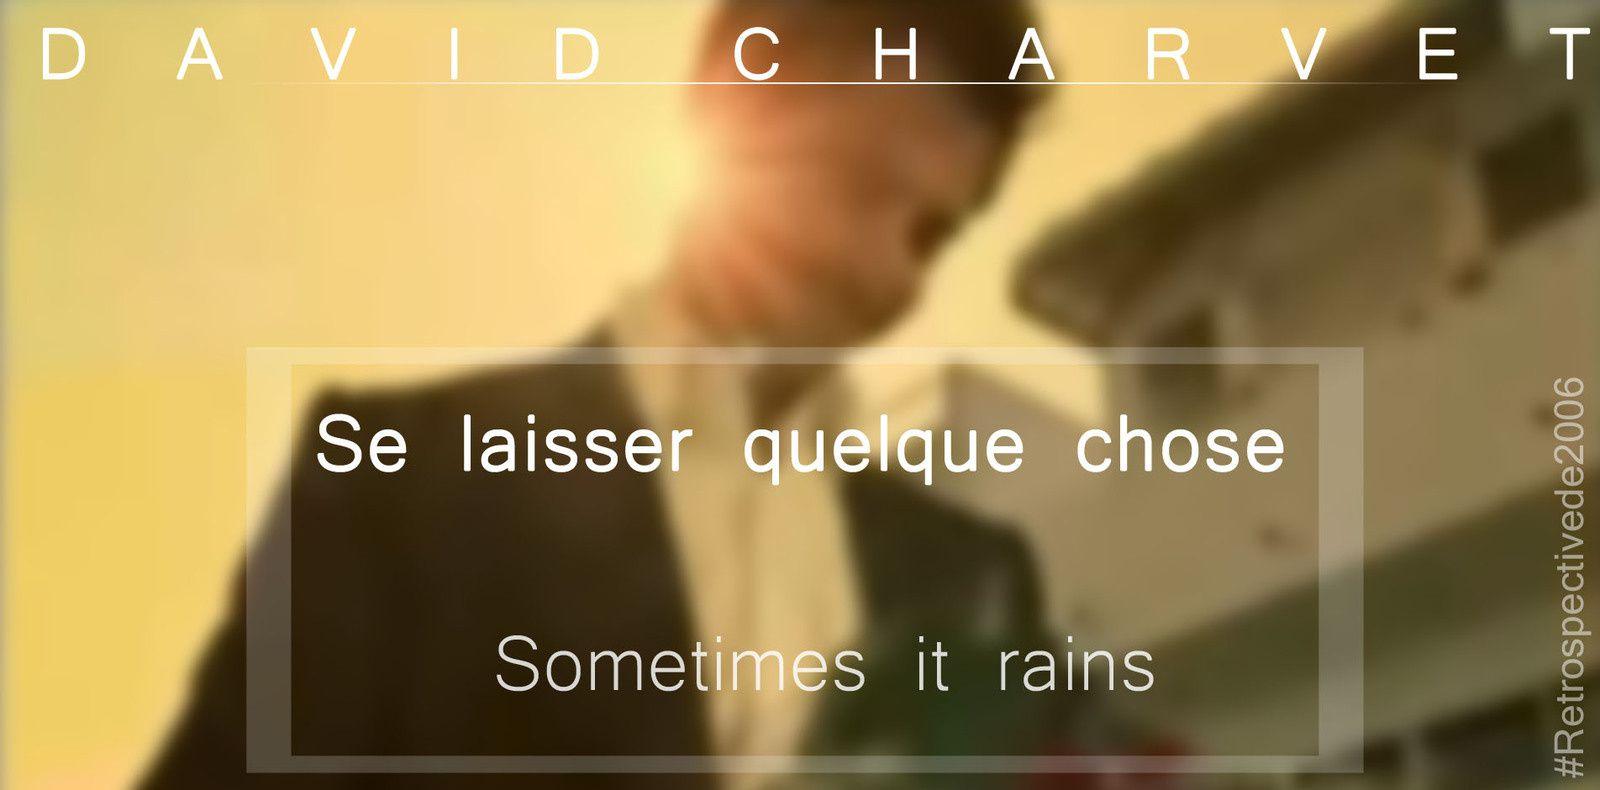 David Charvet - Sometimes it rains